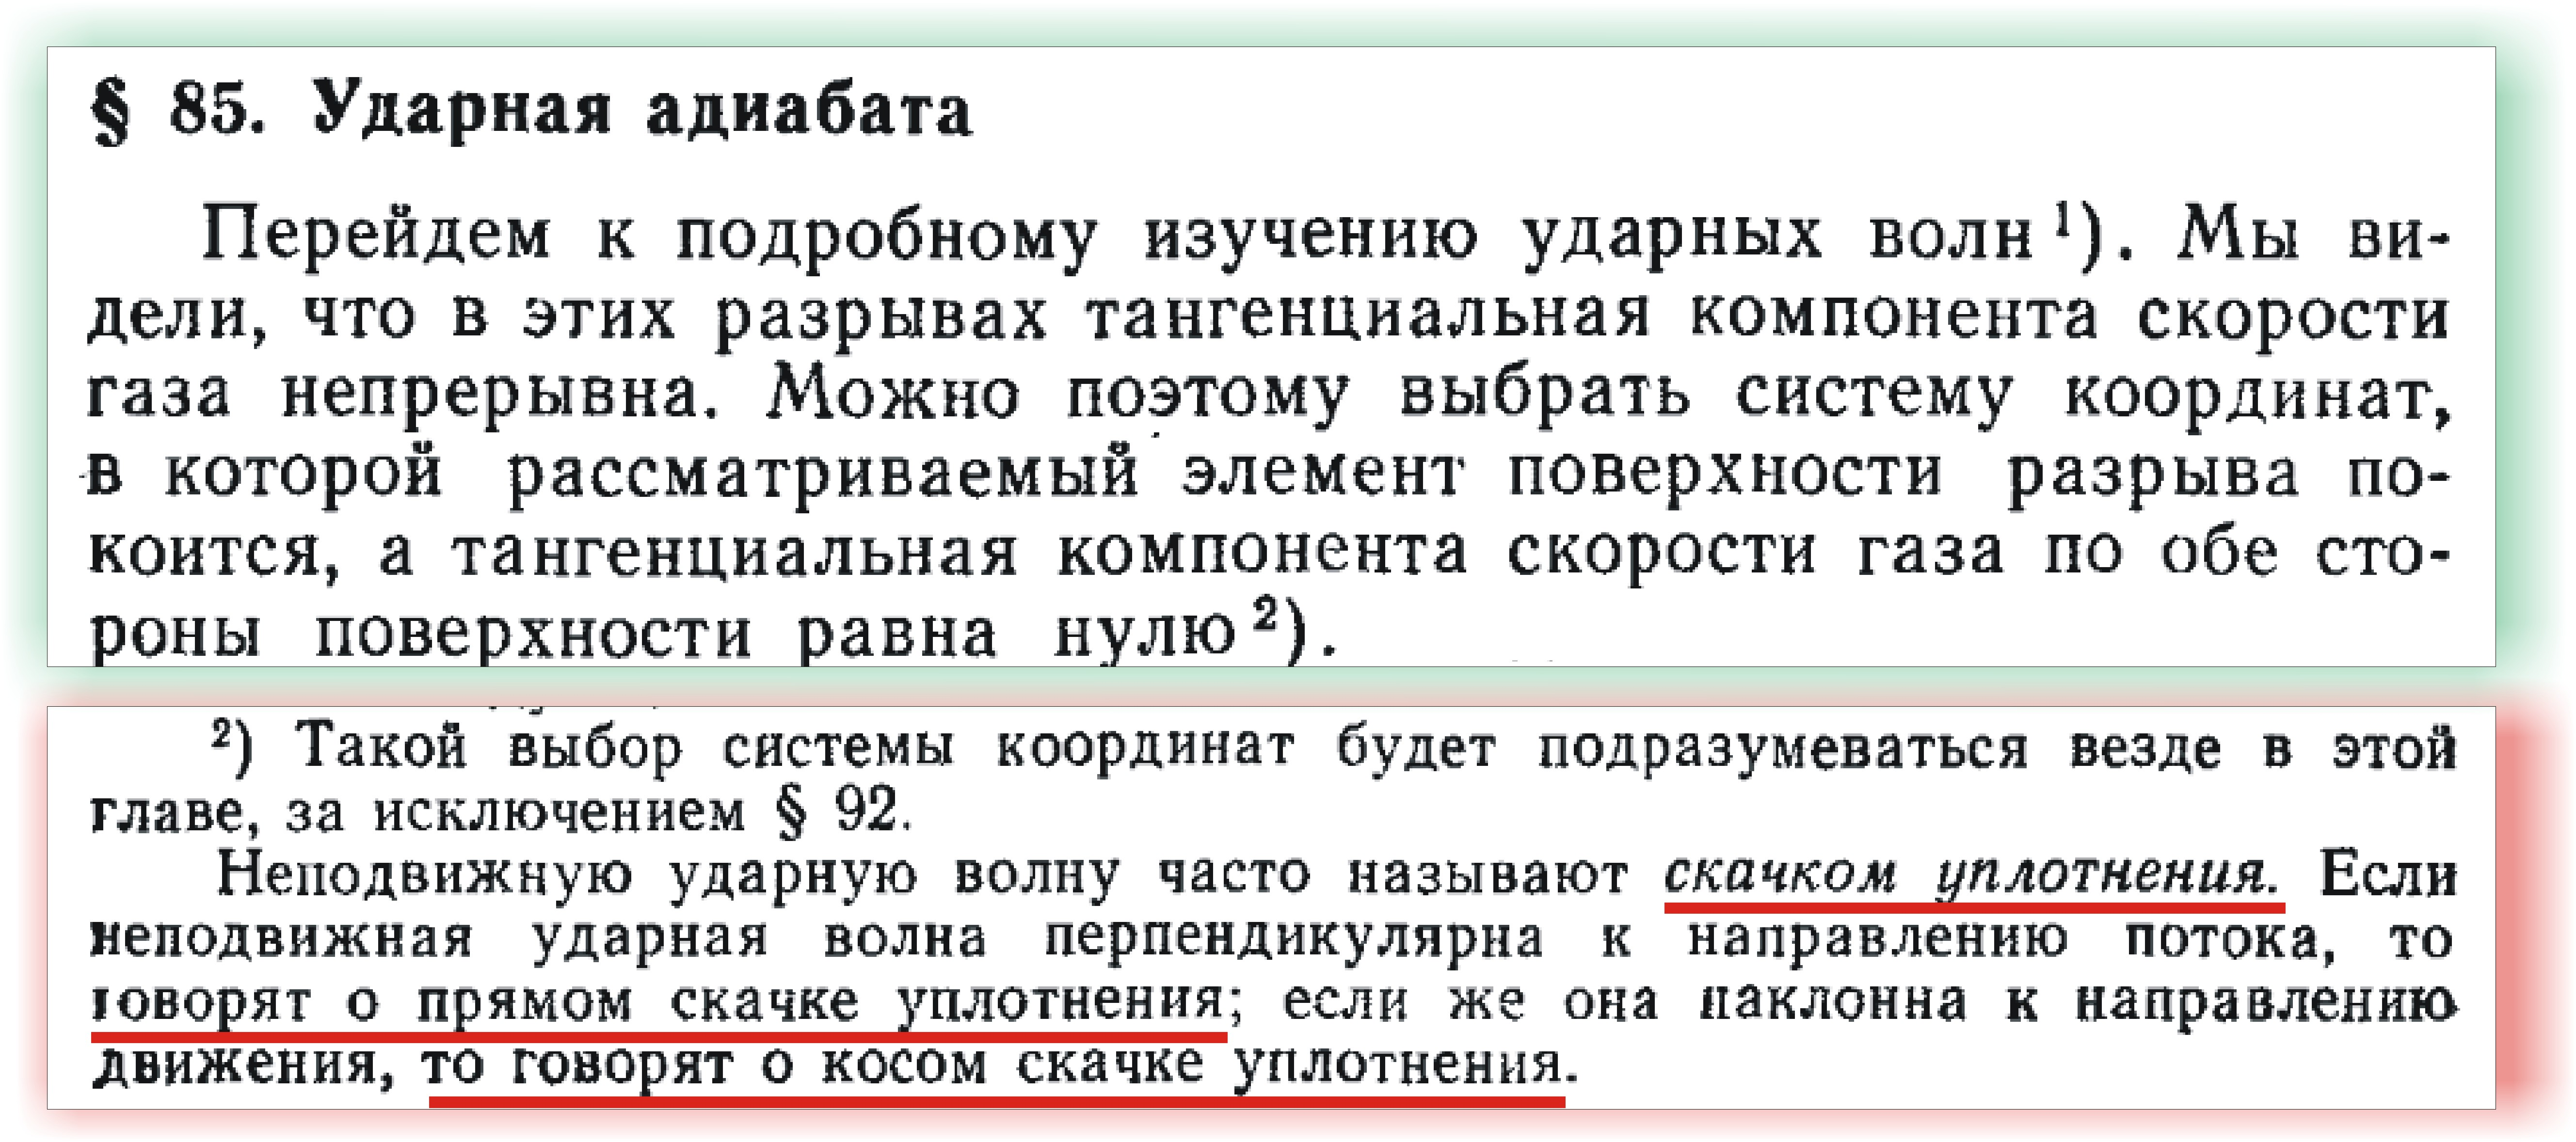 http://images.vfl.ru/ii/1510133017/9f9ba6c6/19330431.jpg